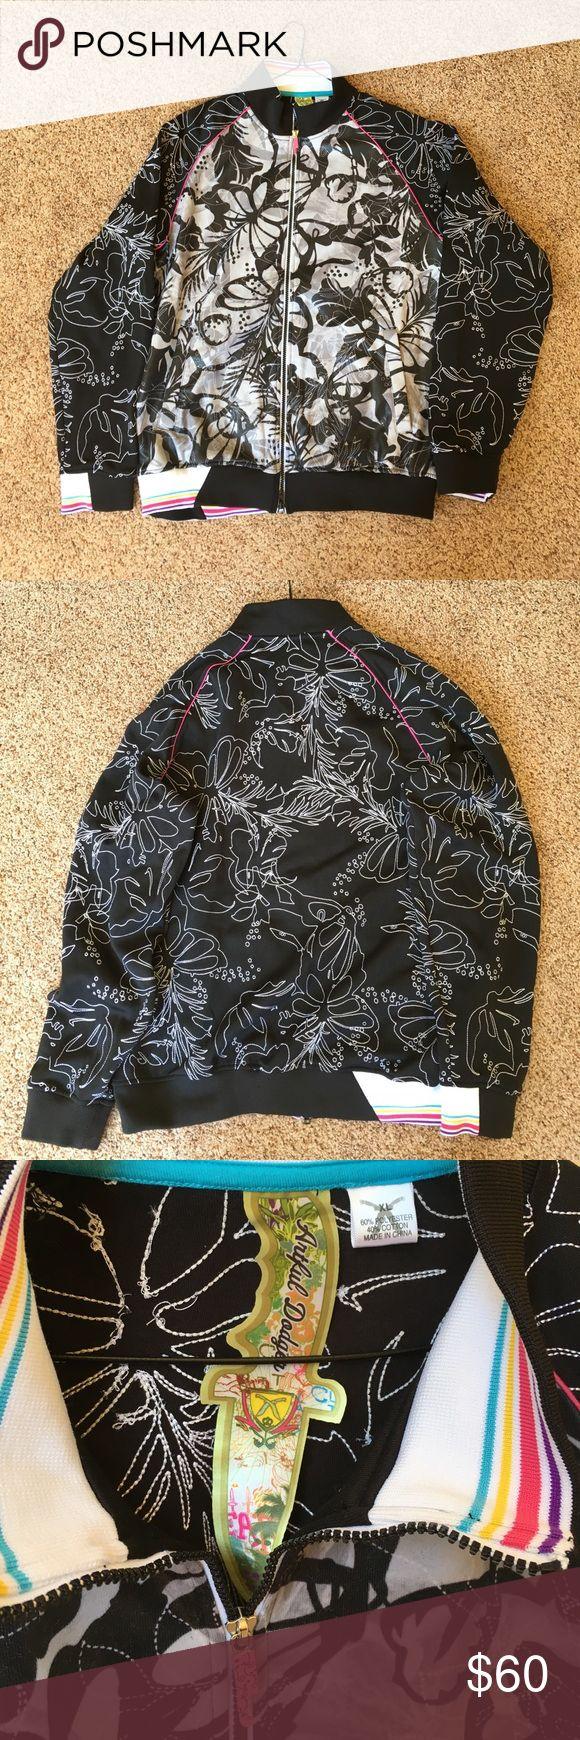 Artful Dodger Trendy Track Jacket Mistake it for brand new! Artful Dodger Jackets & Coats Performance Jackets